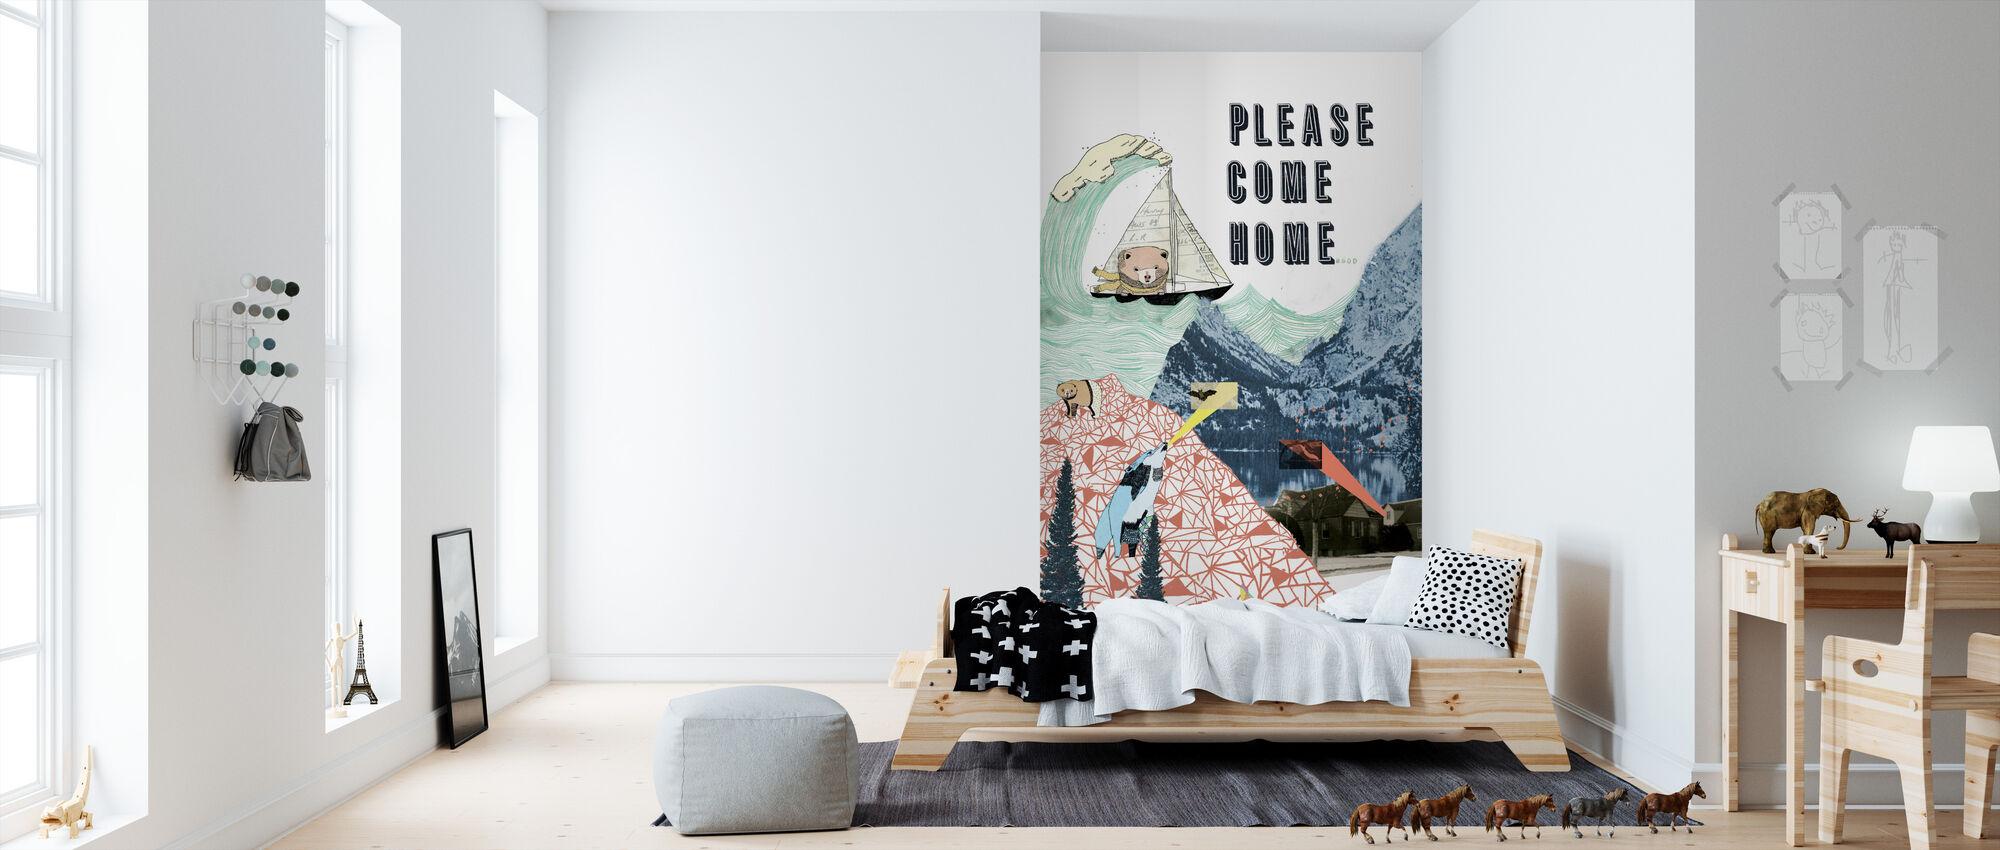 Please Come Home - Wallpaper - Kids Room